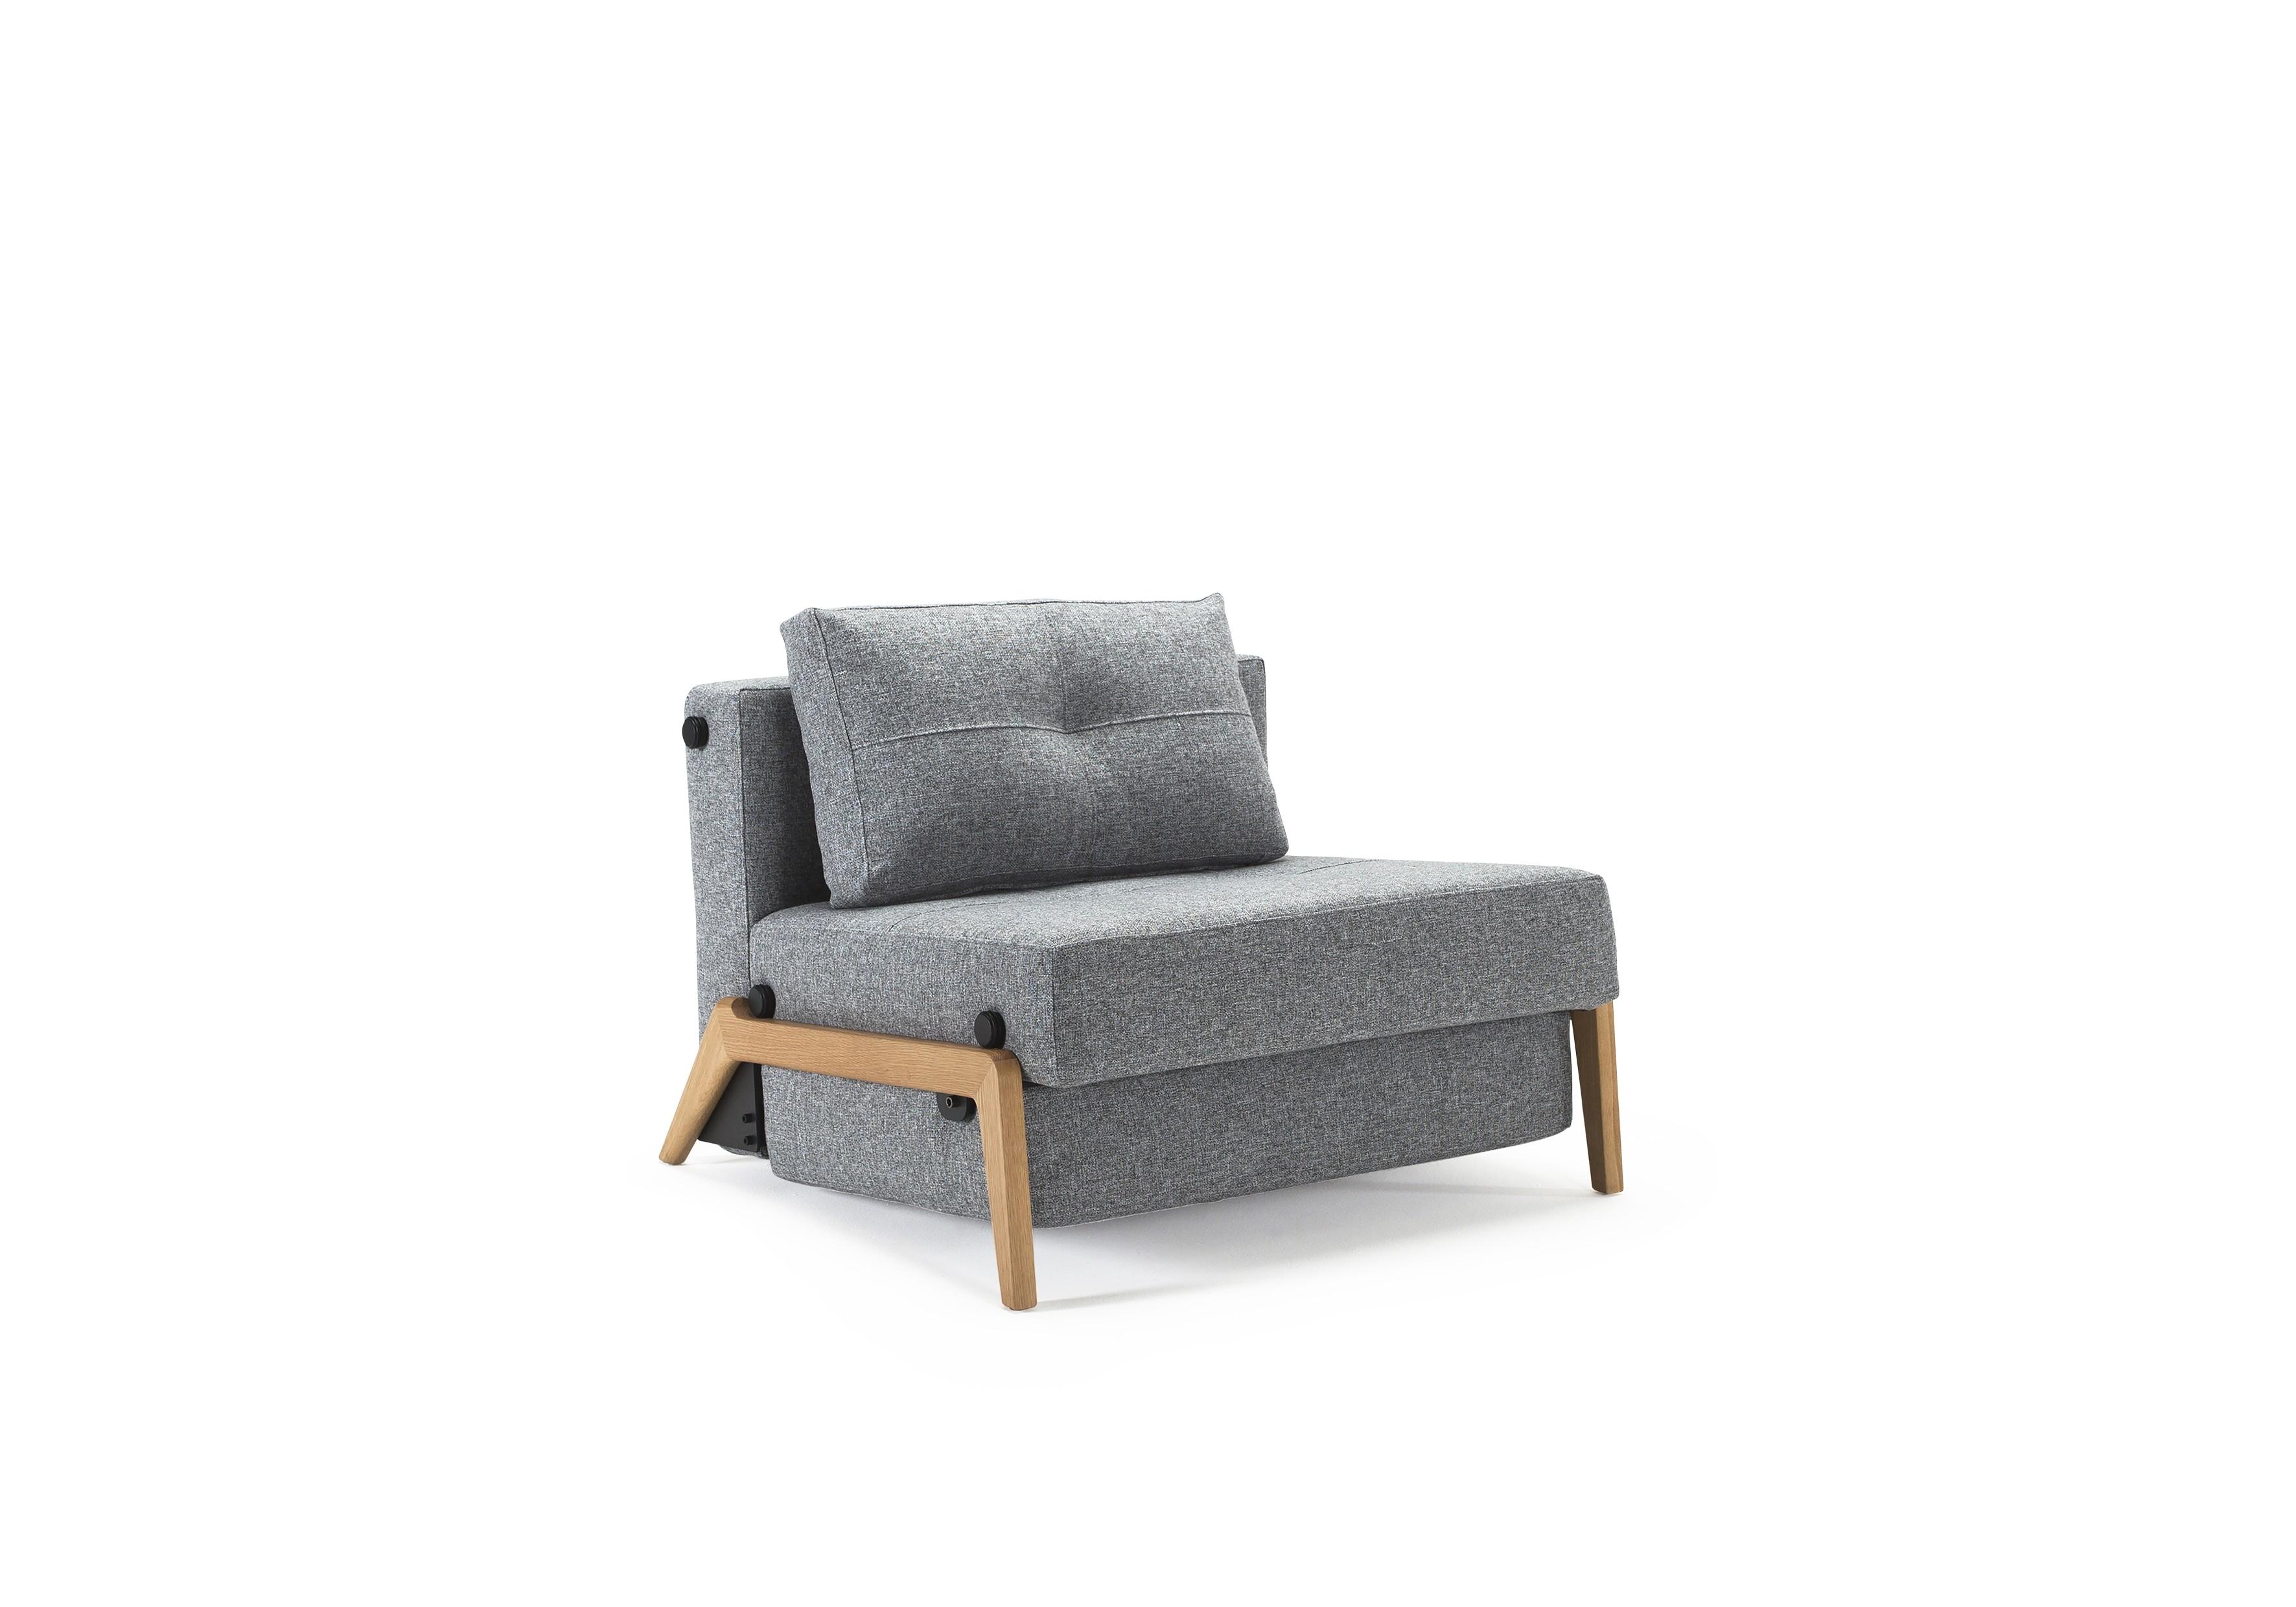 Cubed Deluxe 90 Wood. Sovestol. 90 x 200 cm. 4 farver.-20